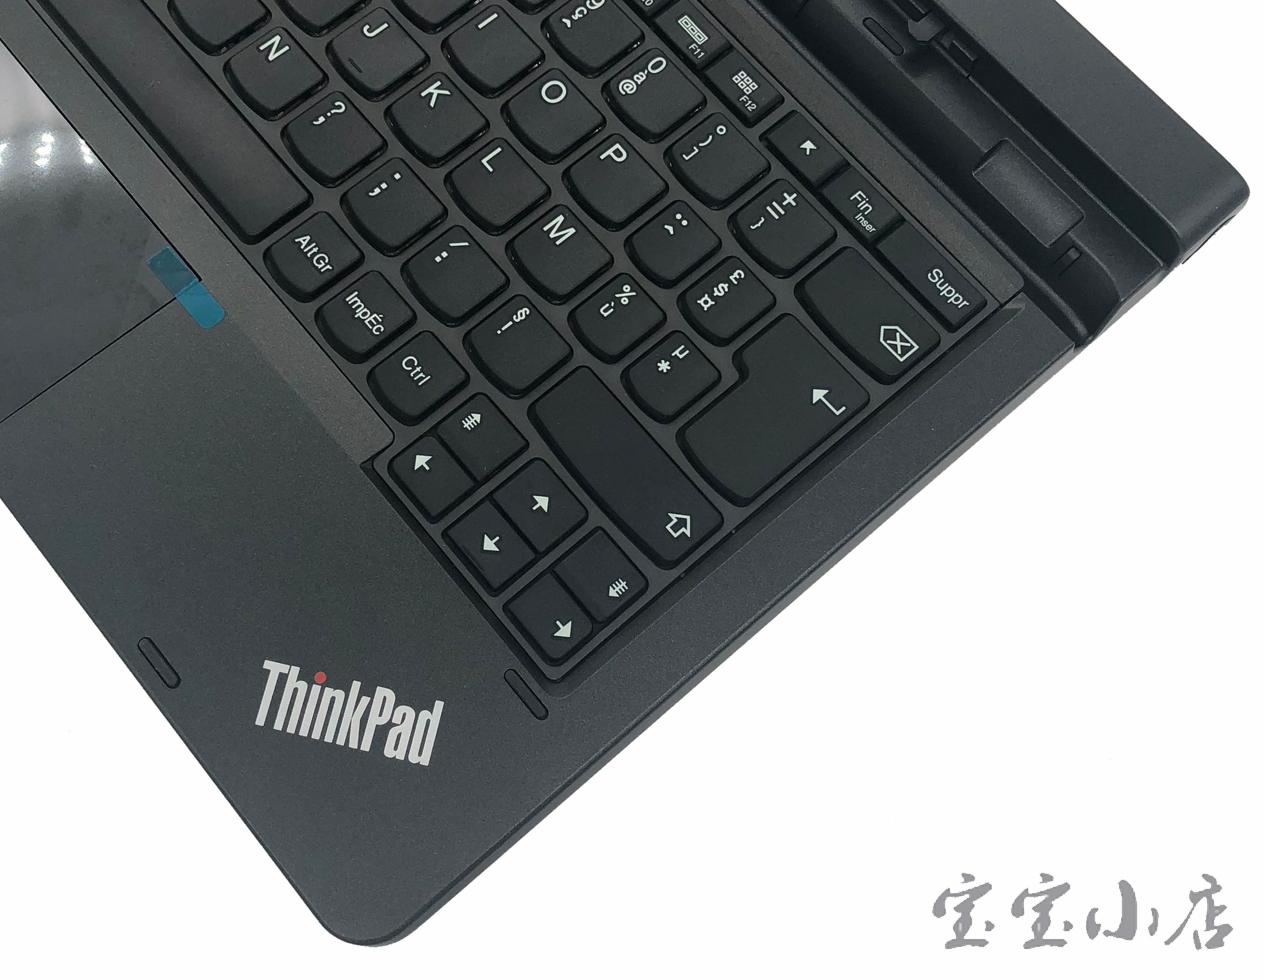 全新00JT761 联想 IBM ThinkPad Helix Ultrabook keyboard Franch底座 键盘 拓展坞 USB